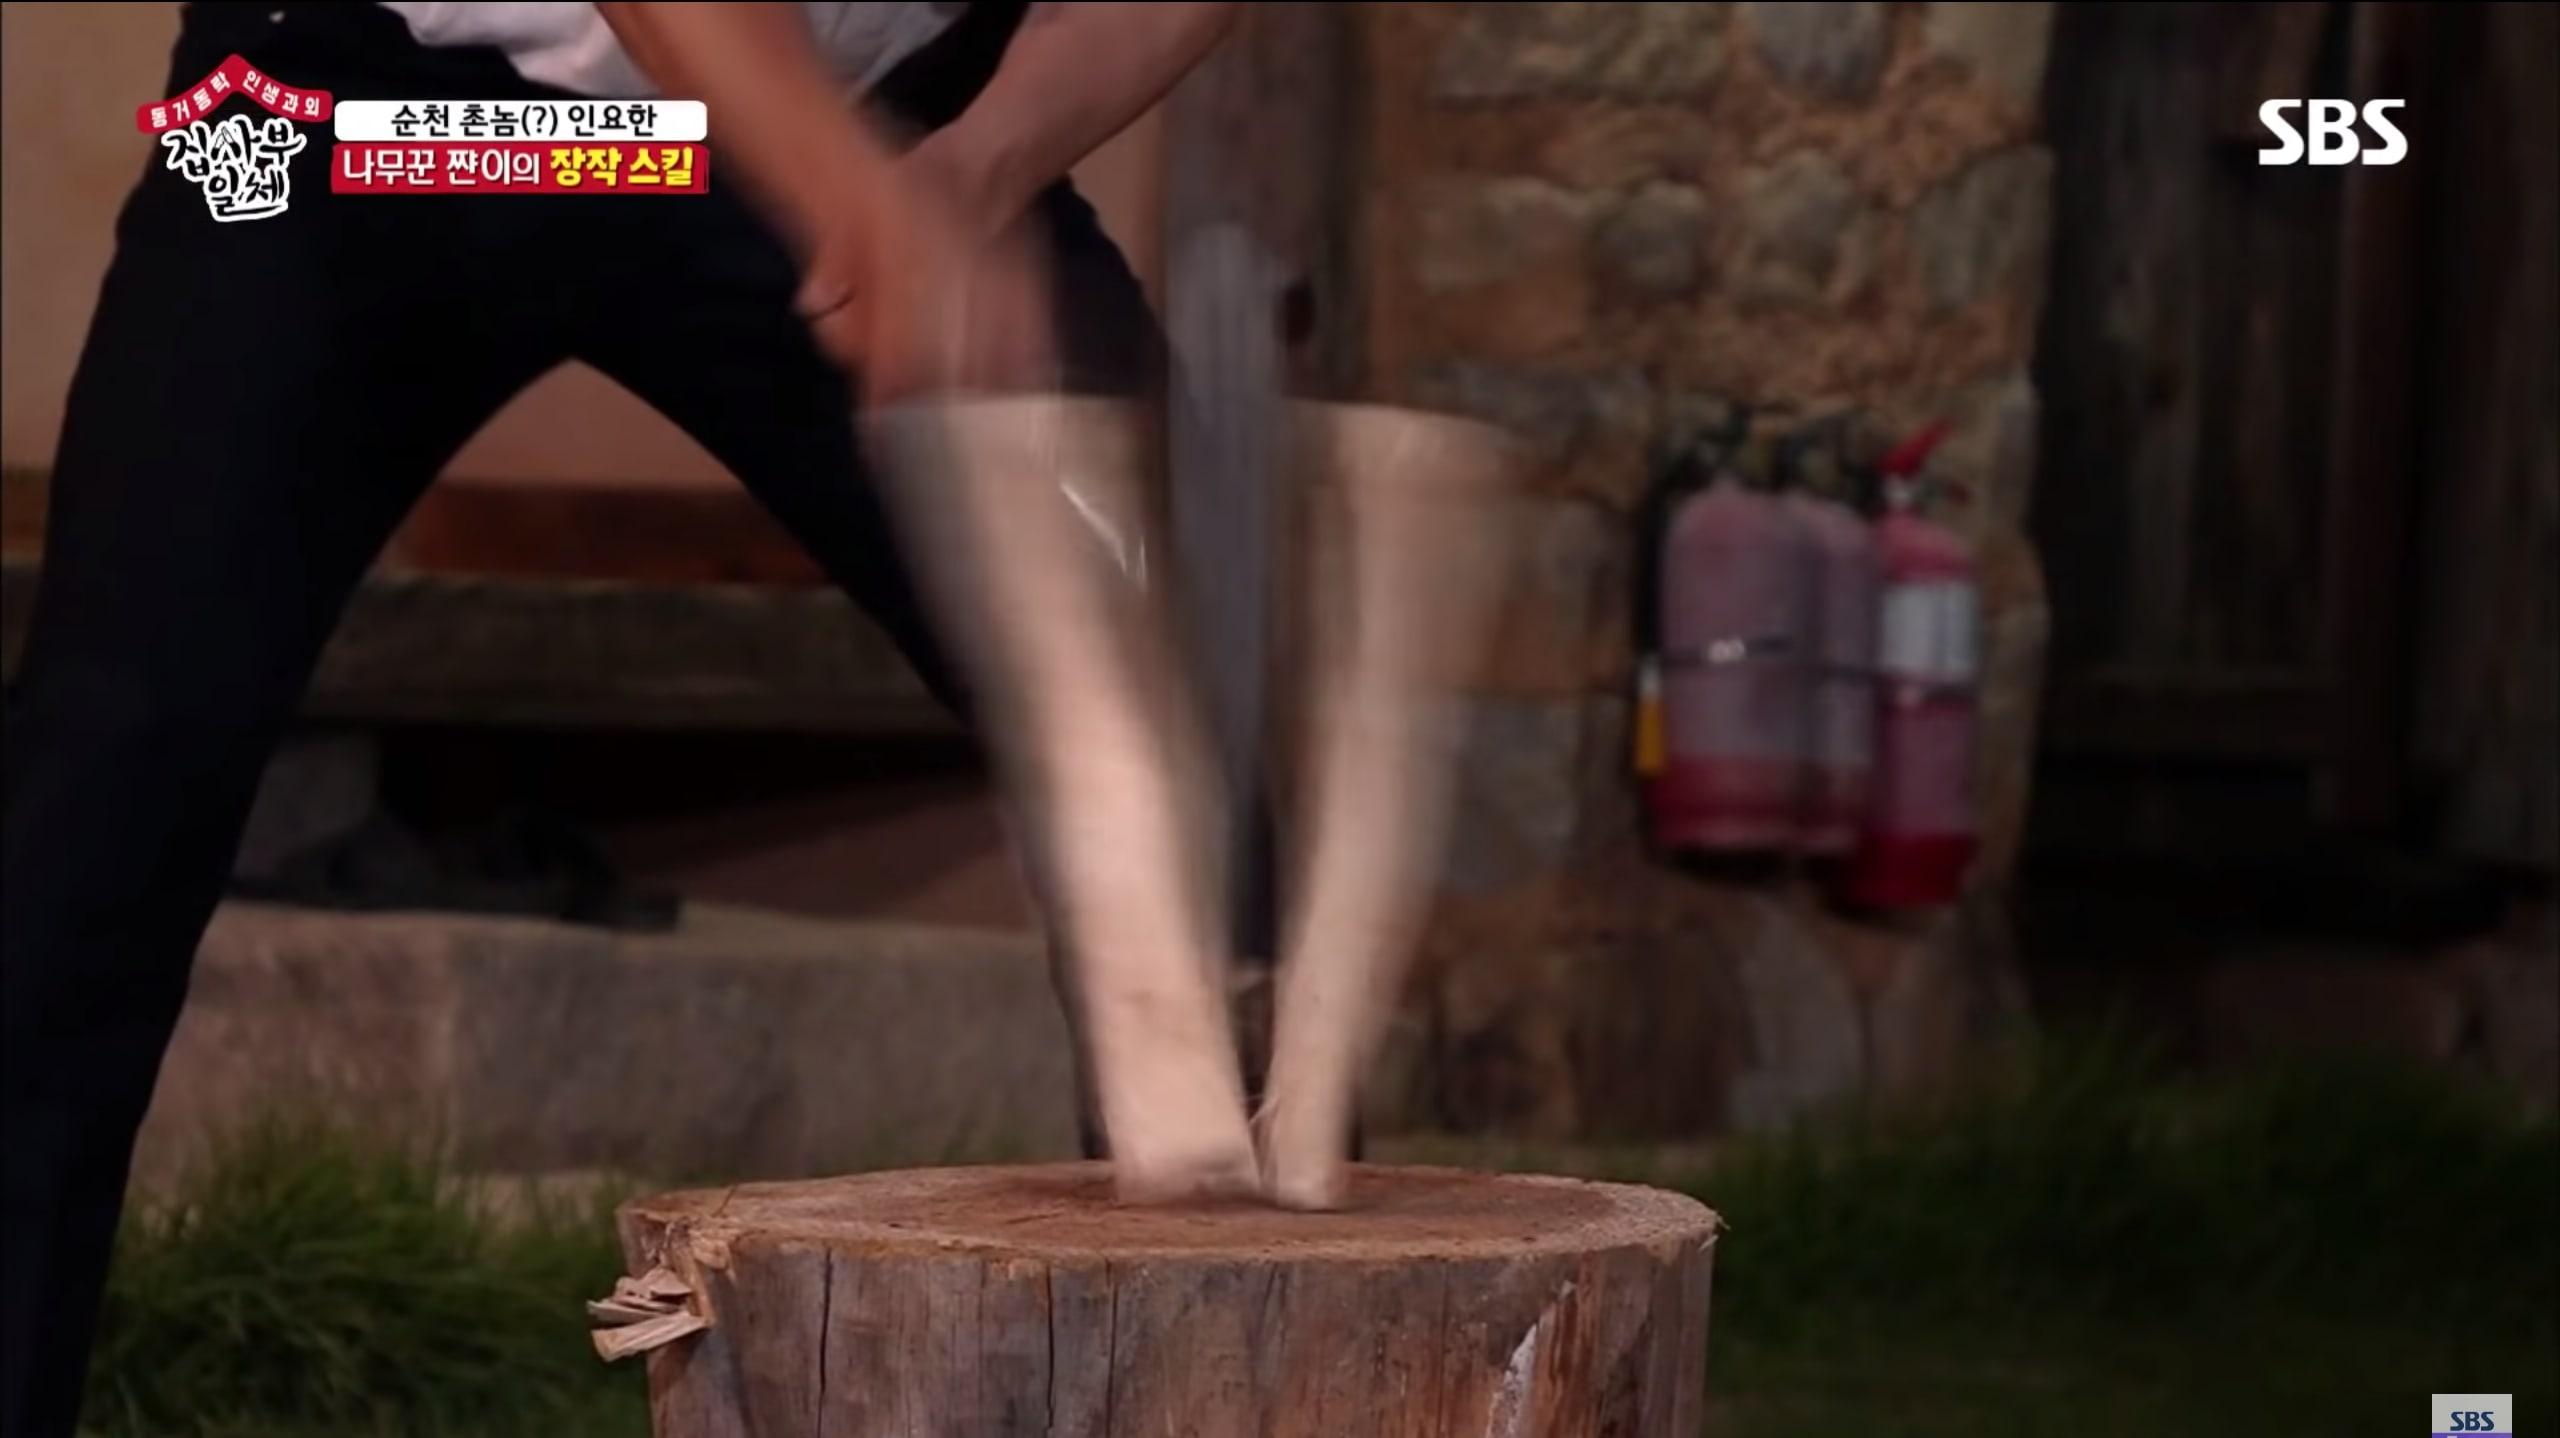 Lee Seung Gi Shows Off Impressive Wood-Splitting Skills On